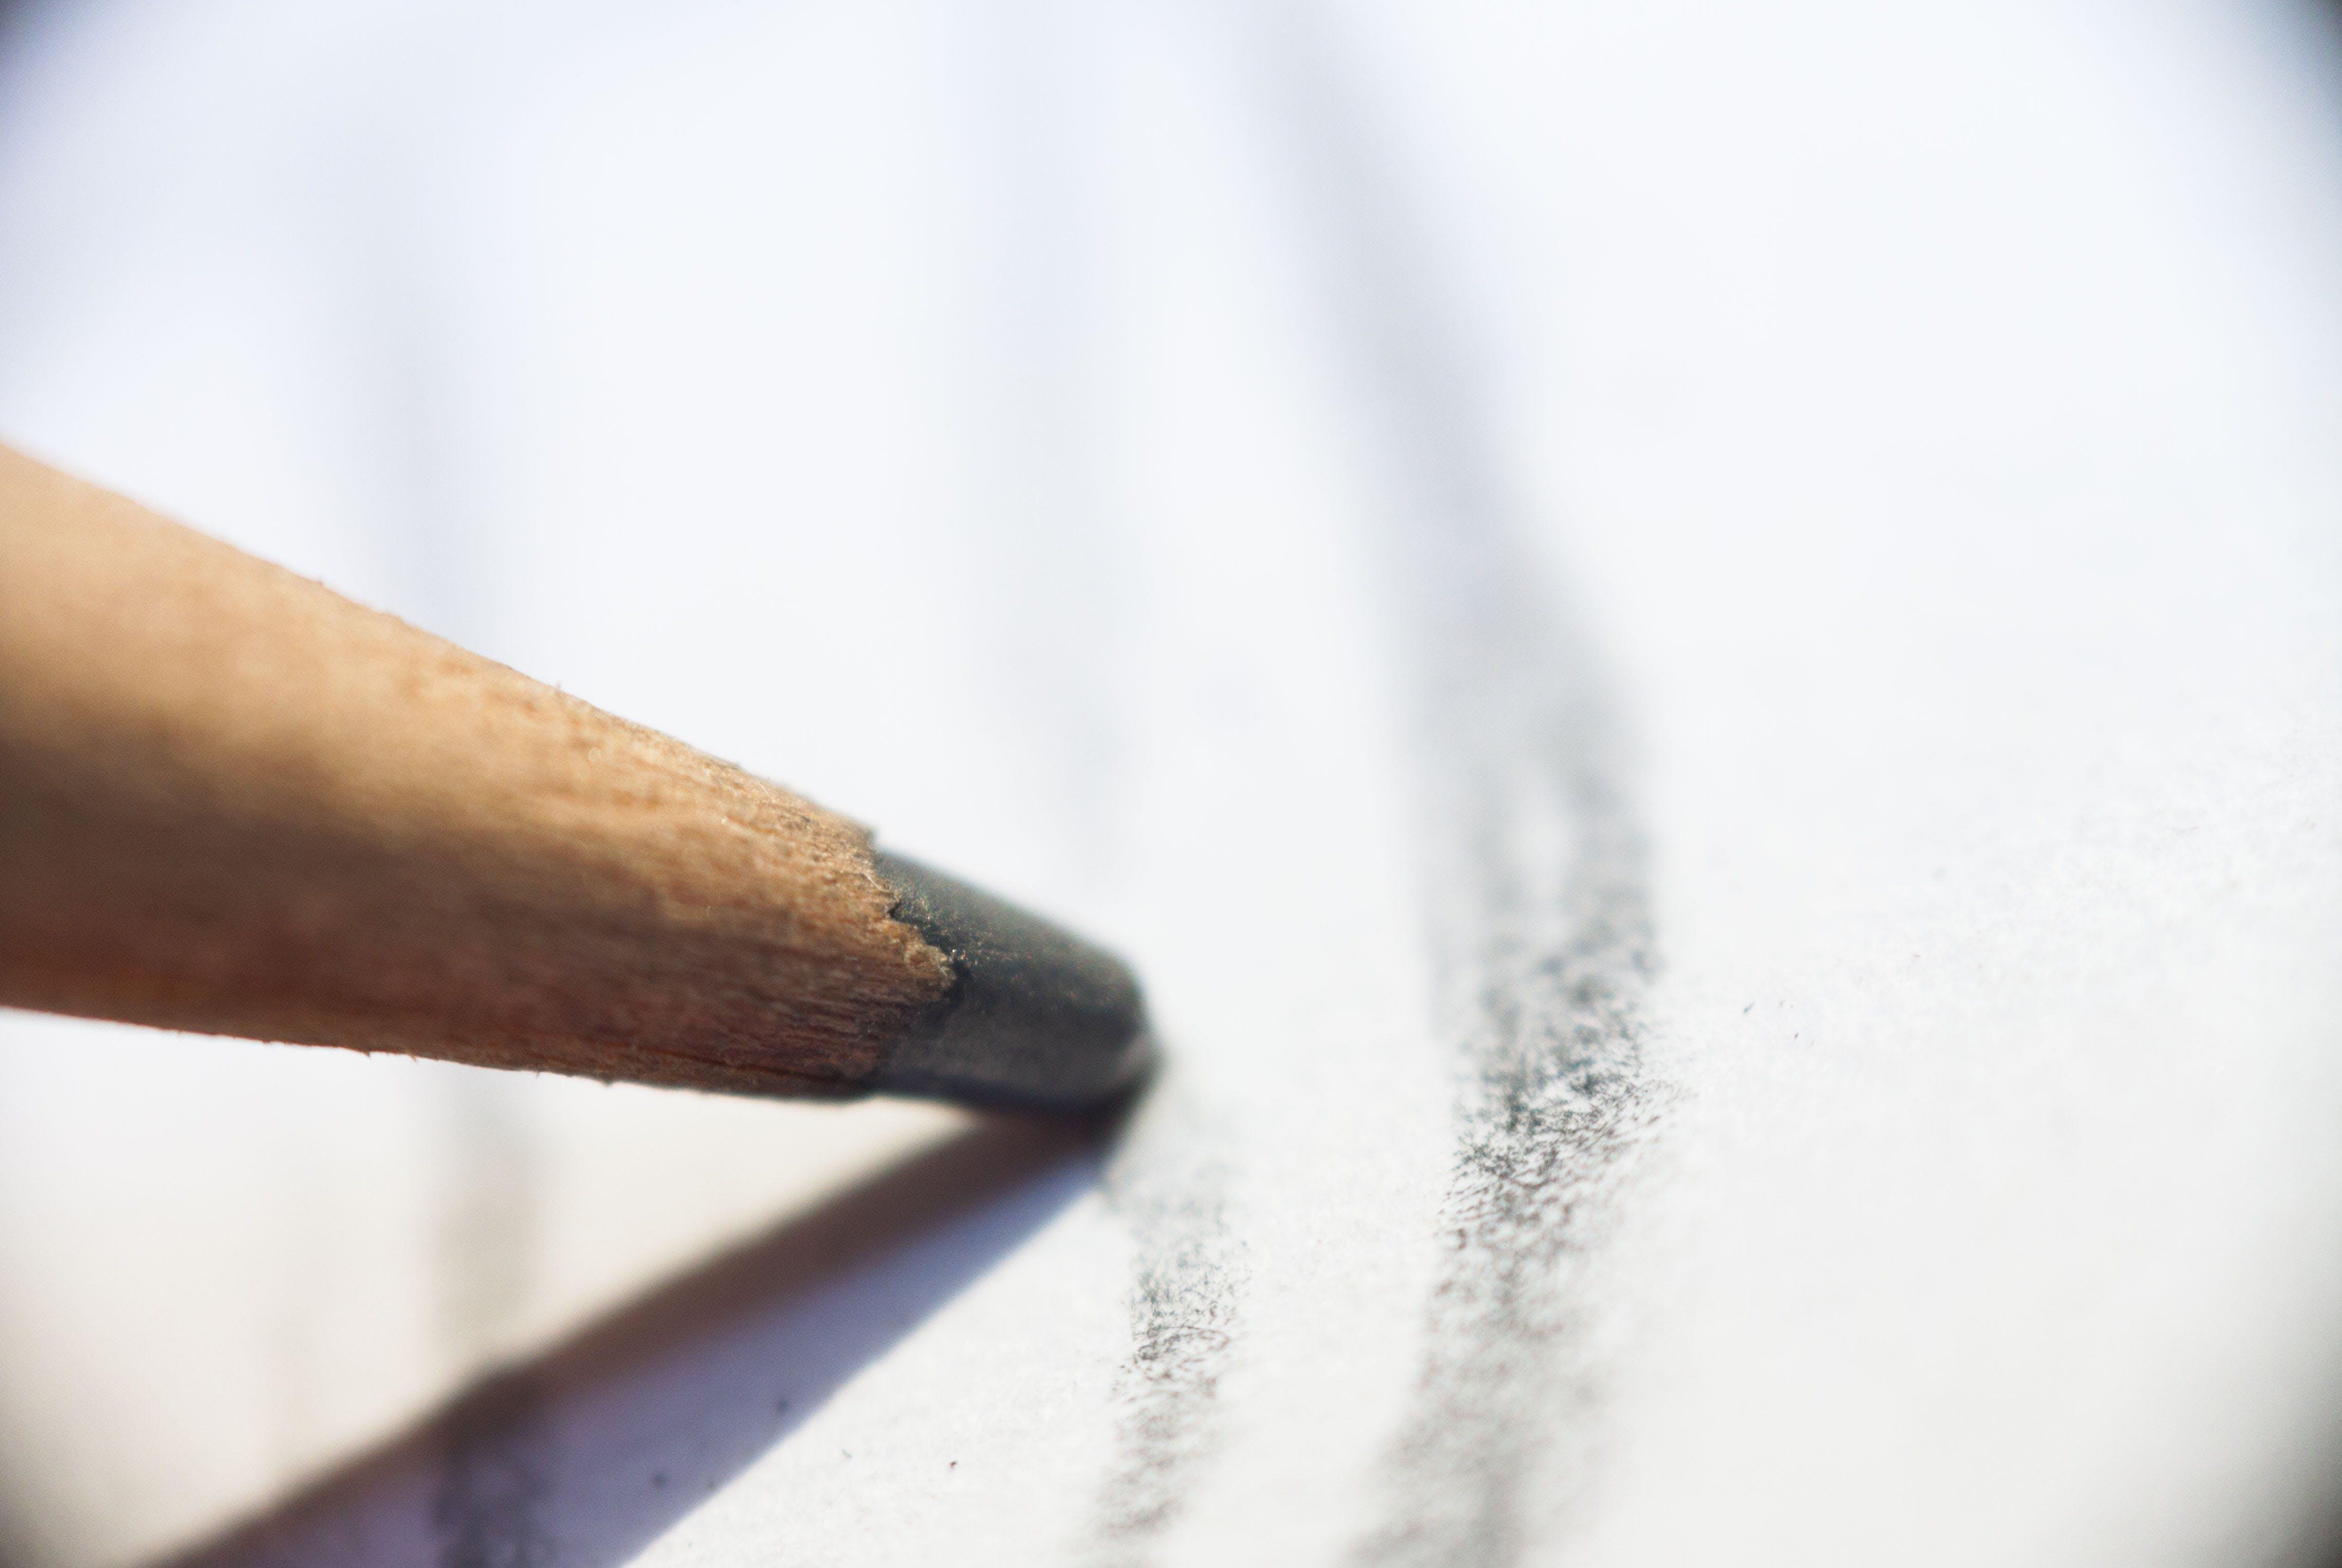 of #2, drawing, graphite, macro